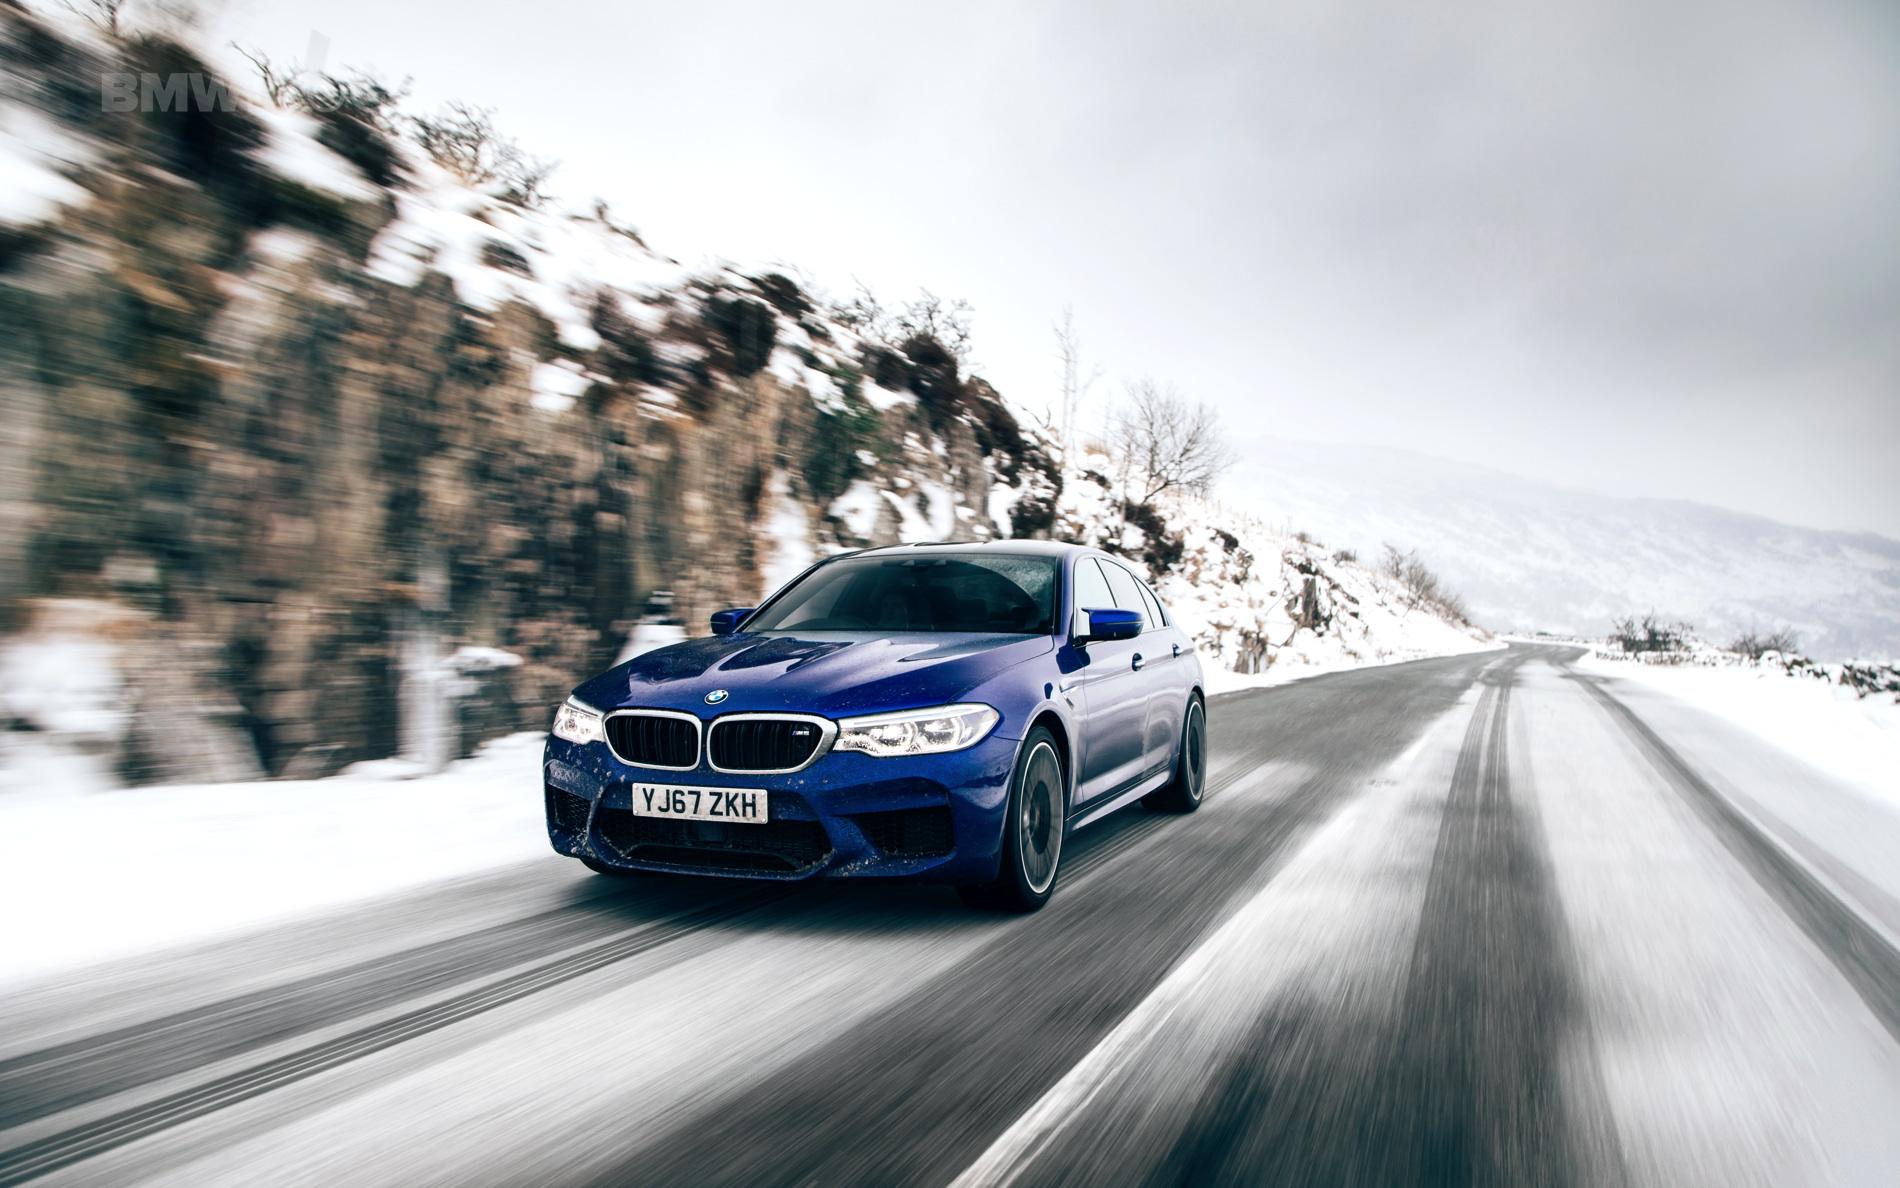 2018 BMW M5 Saloon UK 24